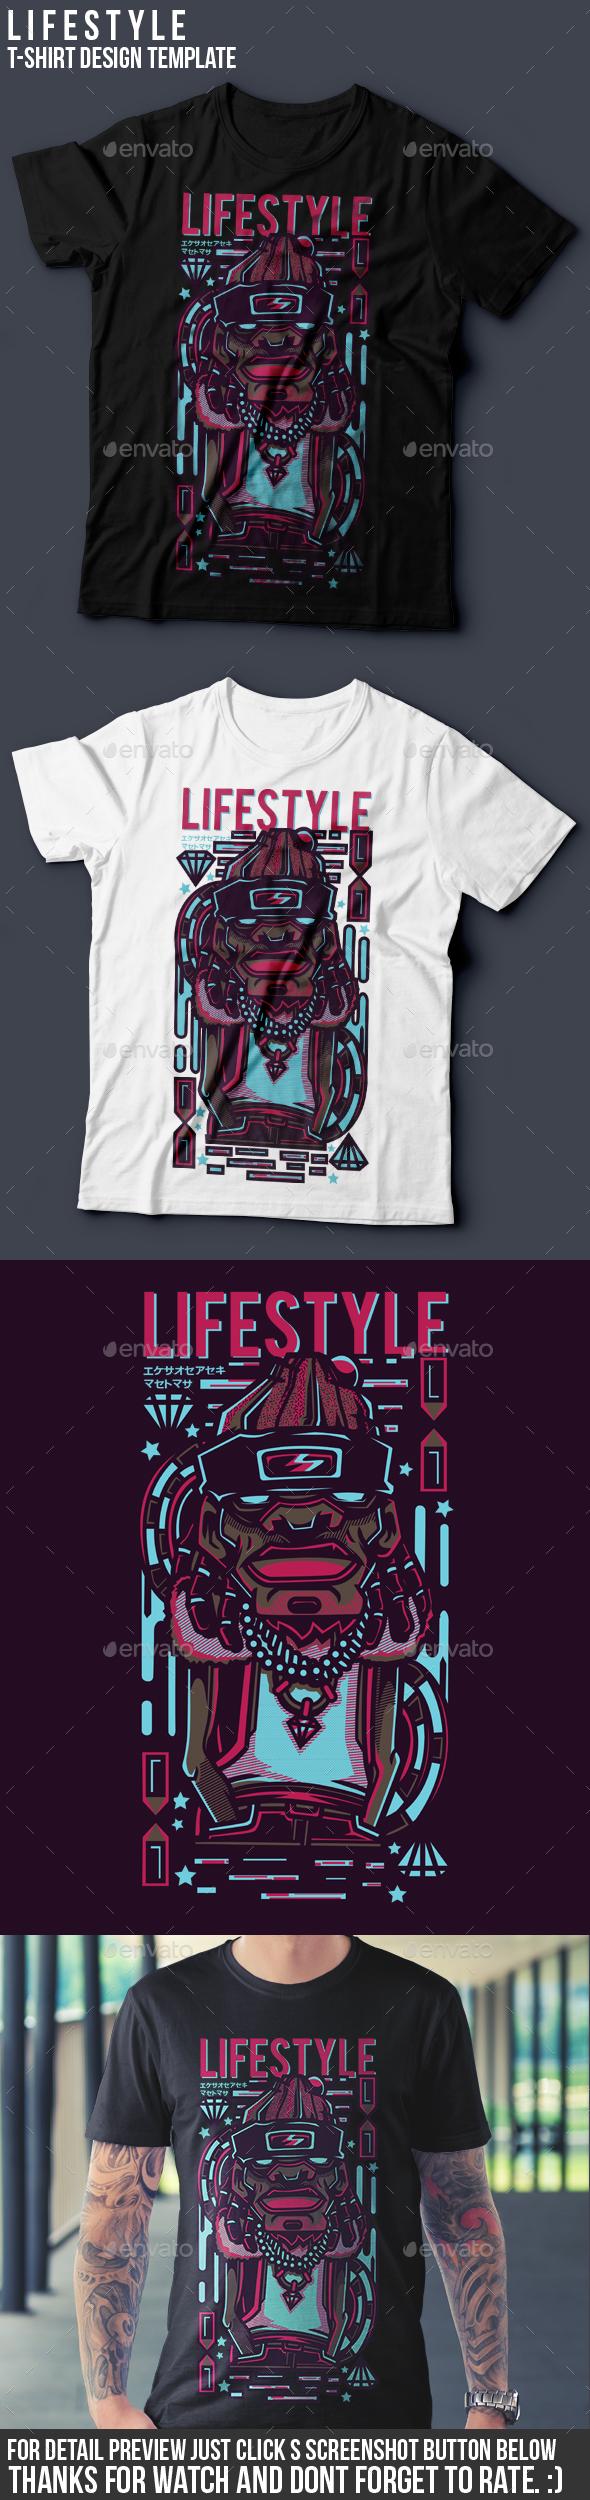 LIfestyle T-Shirt Design - Events T-Shirts